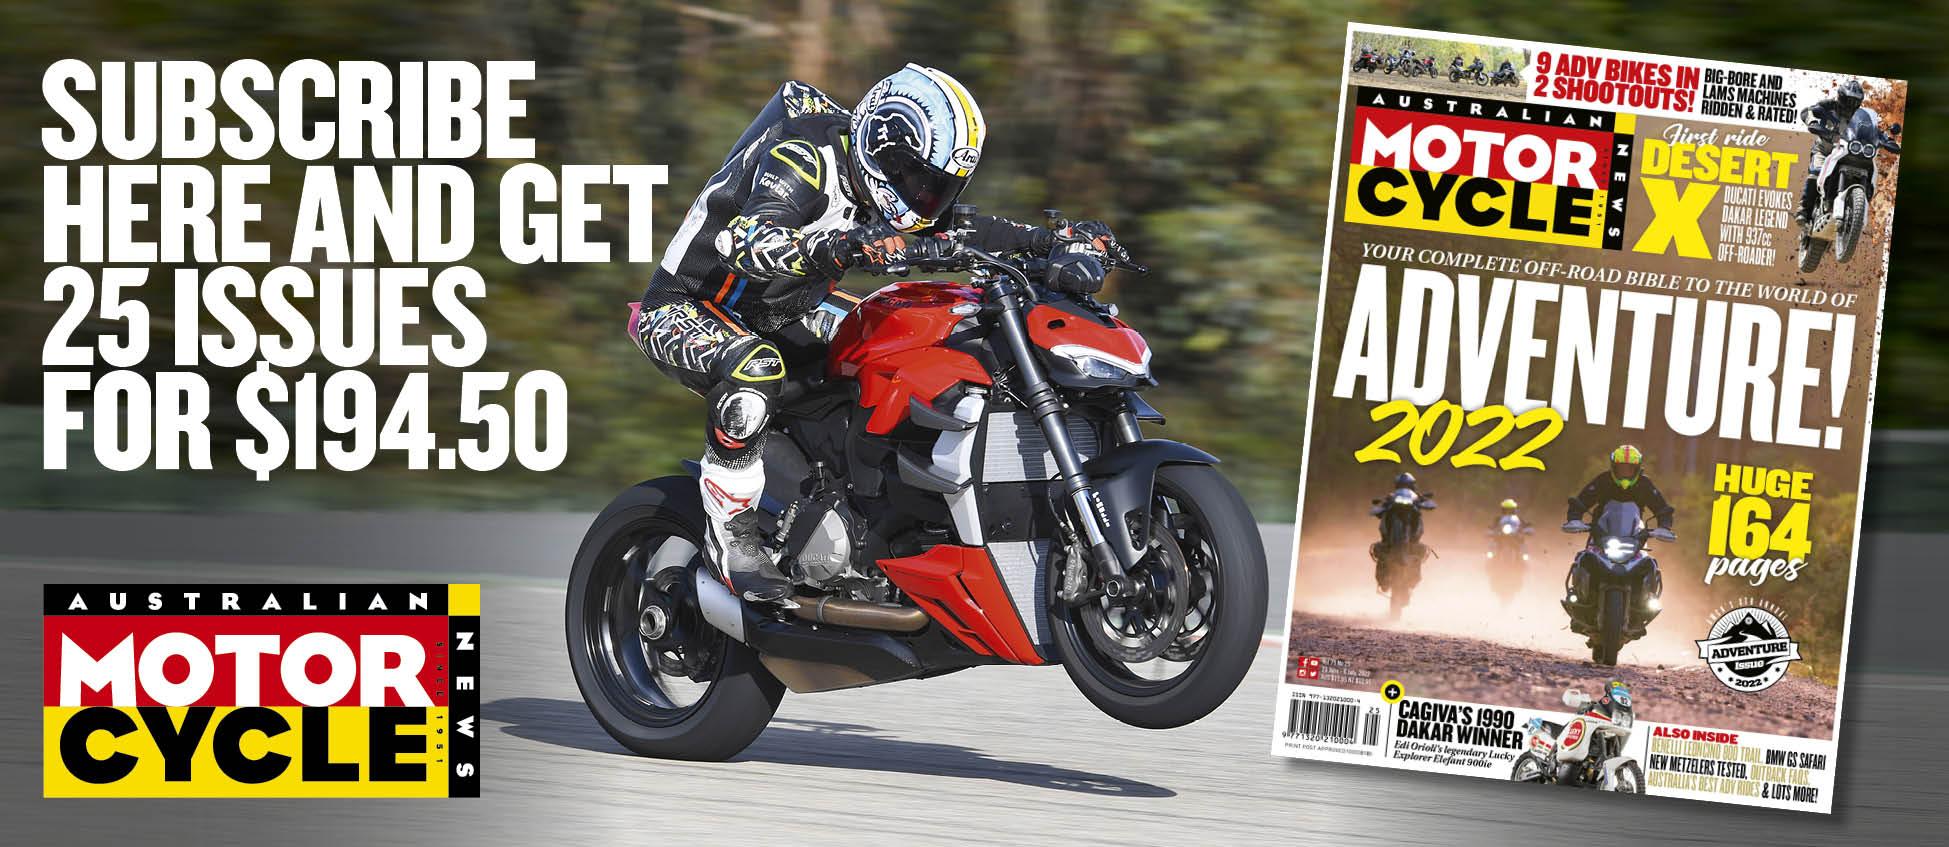 Aust-Motorcycle-News-logo